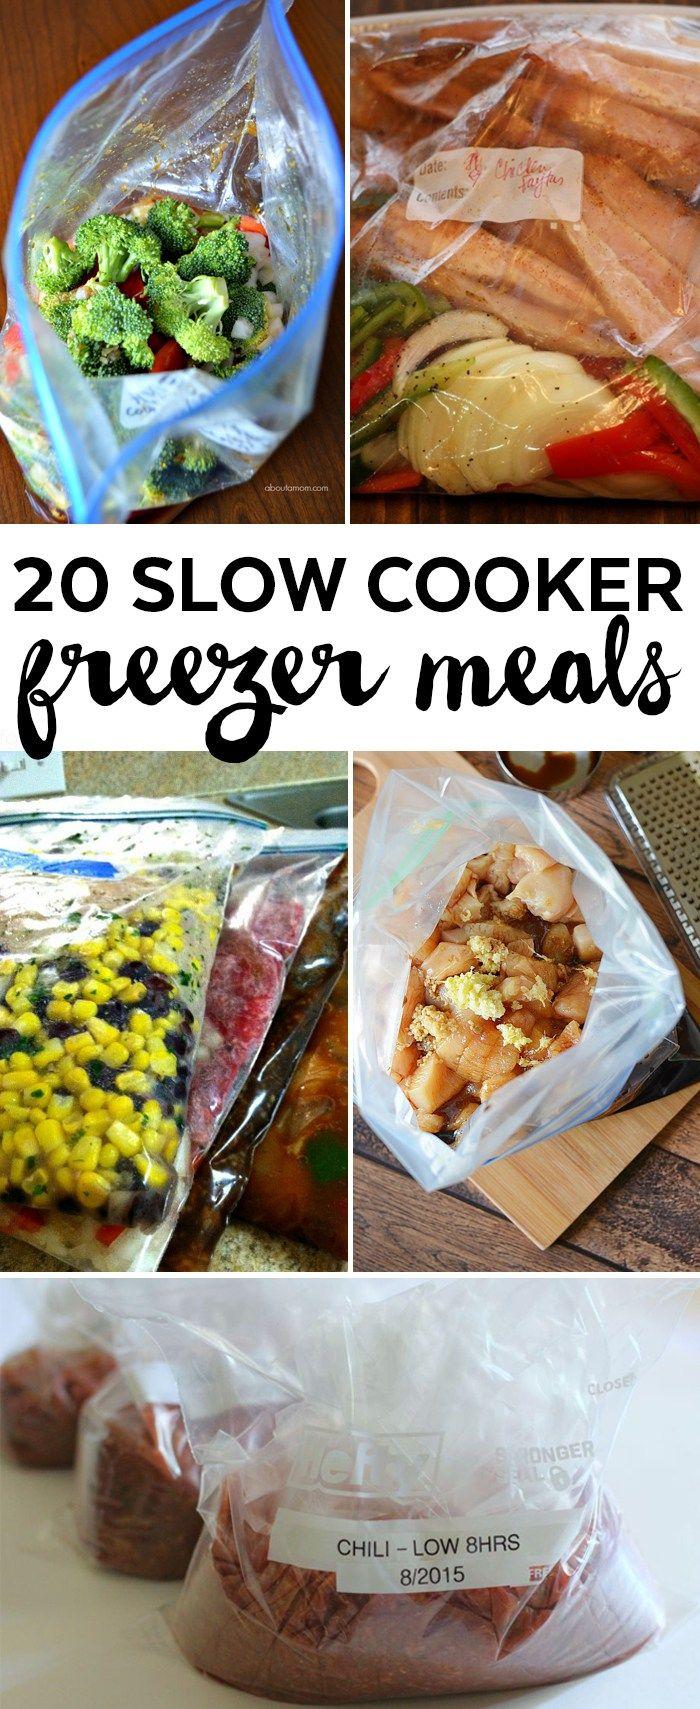 Slow Cooker Freezer Meals for New Moms | Freezer Crockpot Meals | Make Ahead Meals Slow Cooker Recipes | Freezer Cooking Recipes | Make Ahead Freezer Meals | Crock Pot Freezer Meals